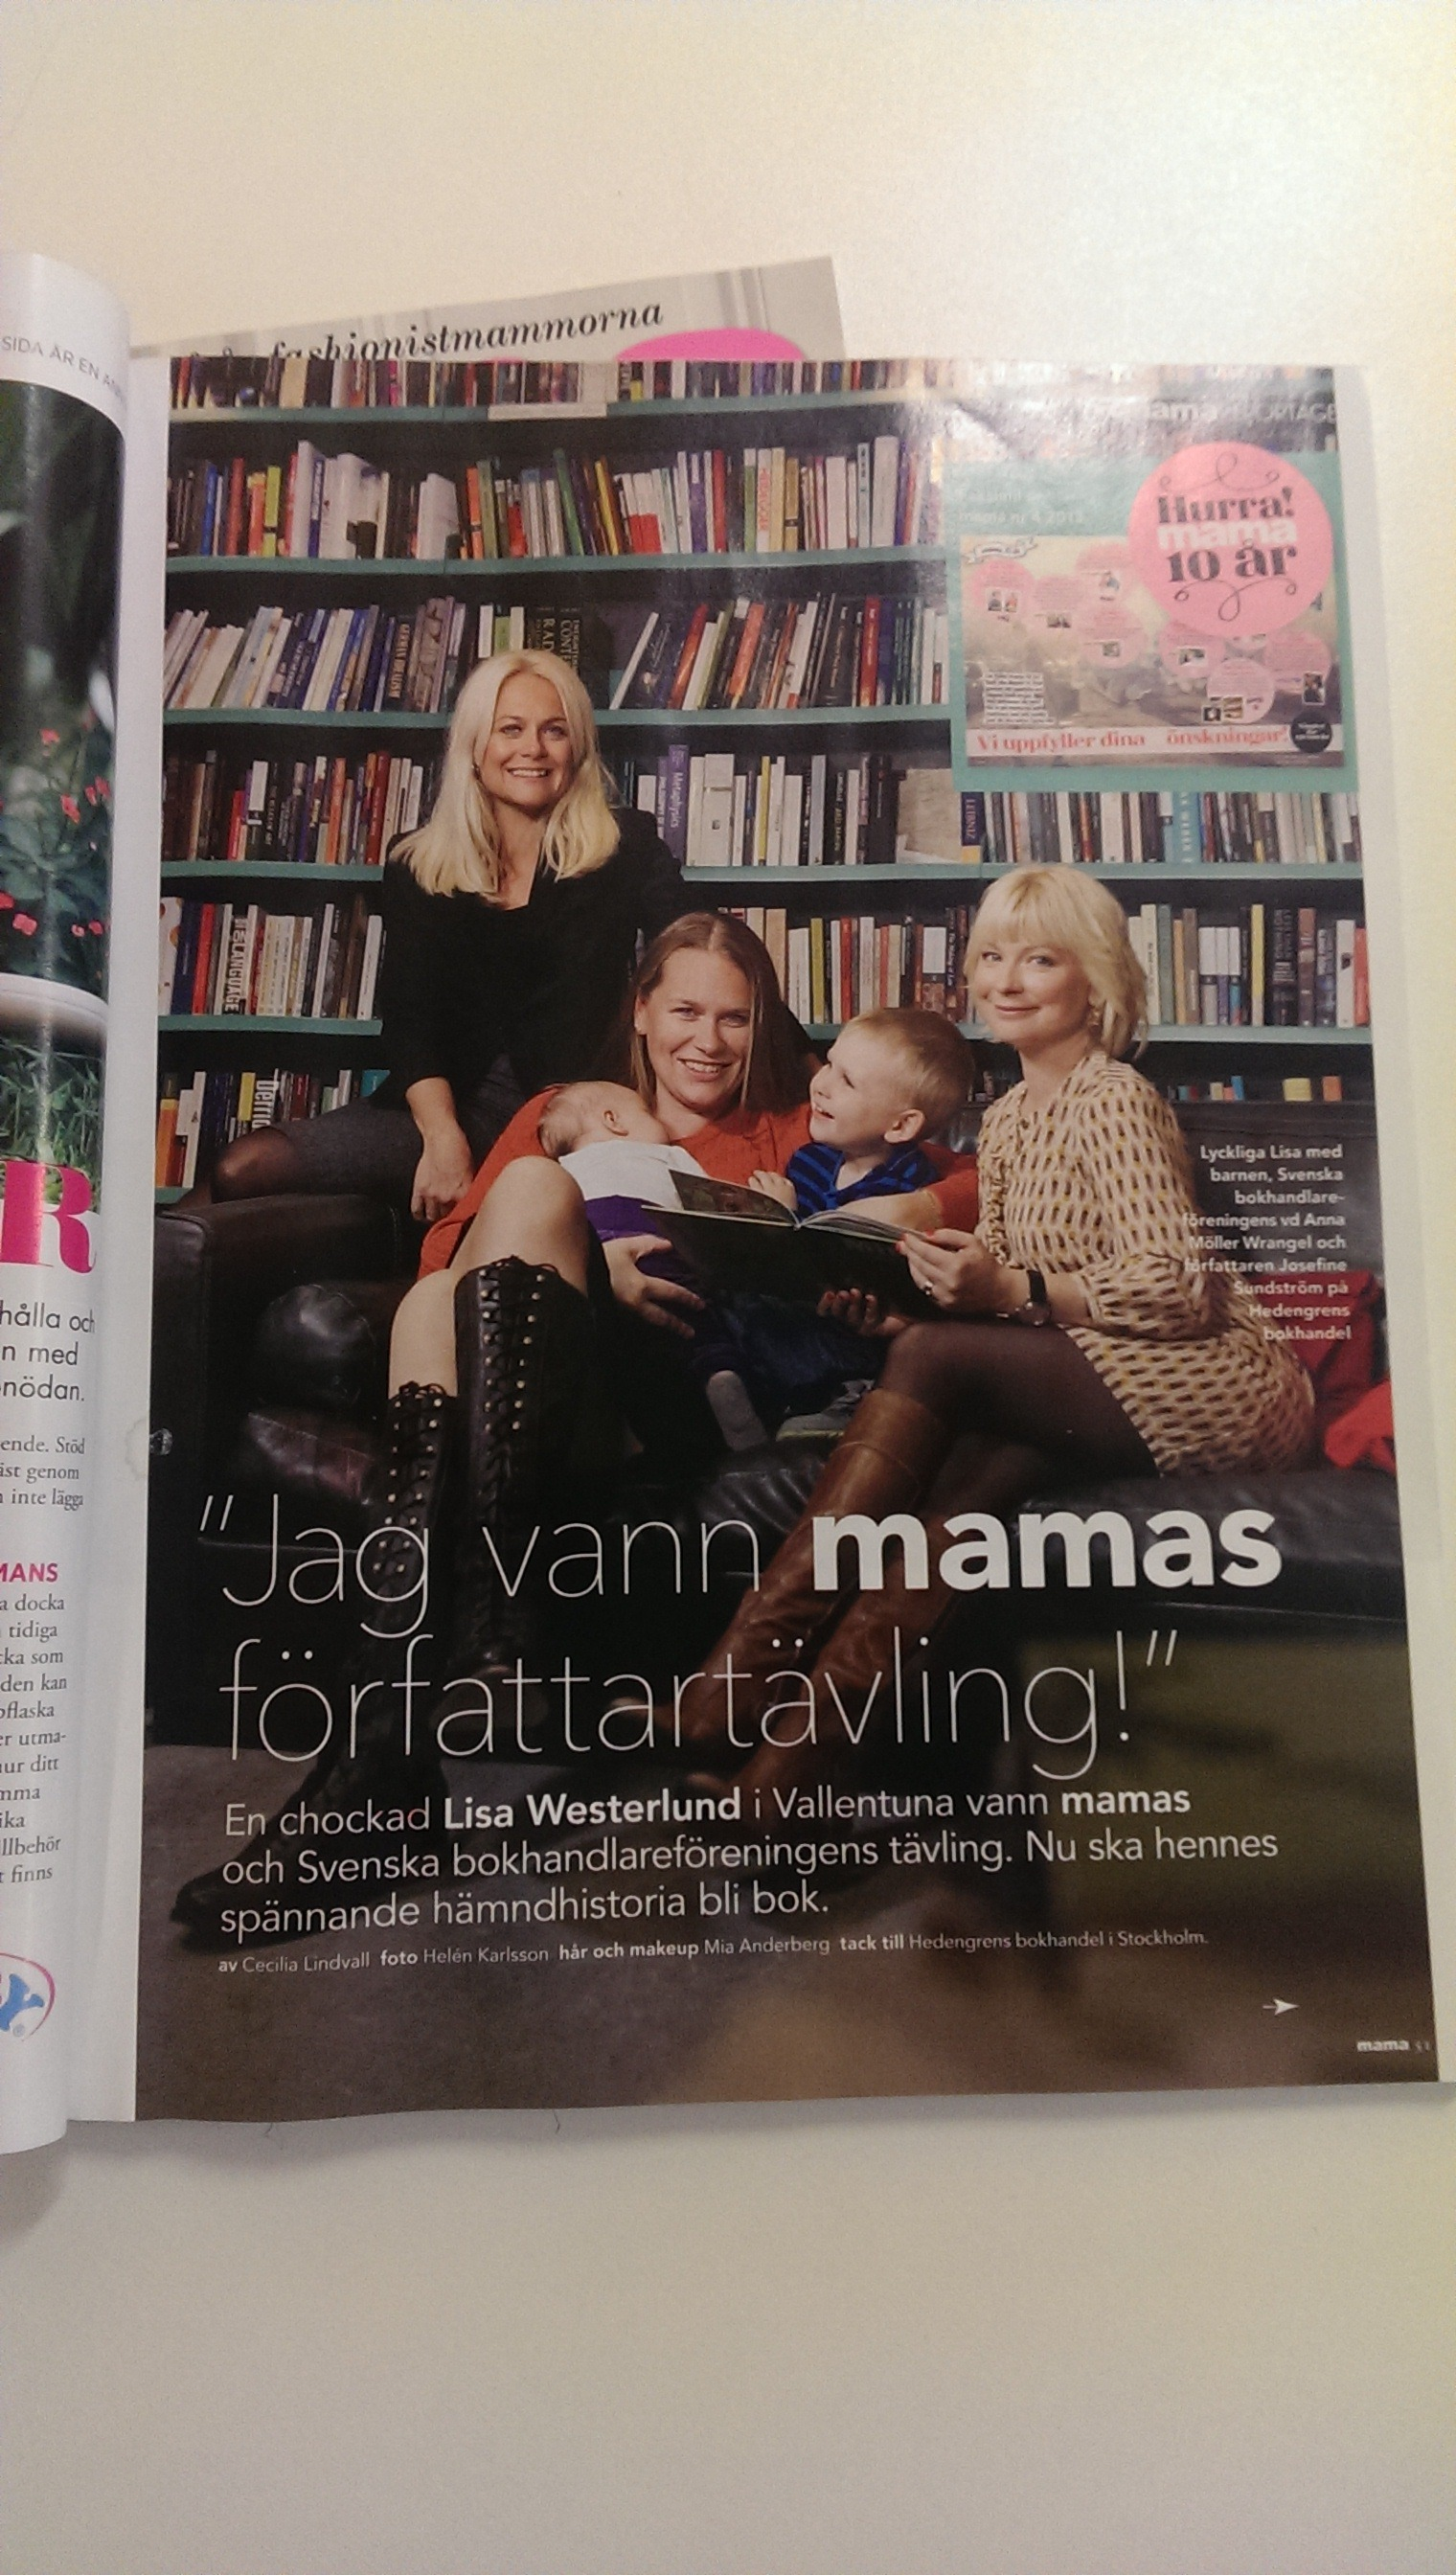 Lisa Westerlund vann mamas tävling